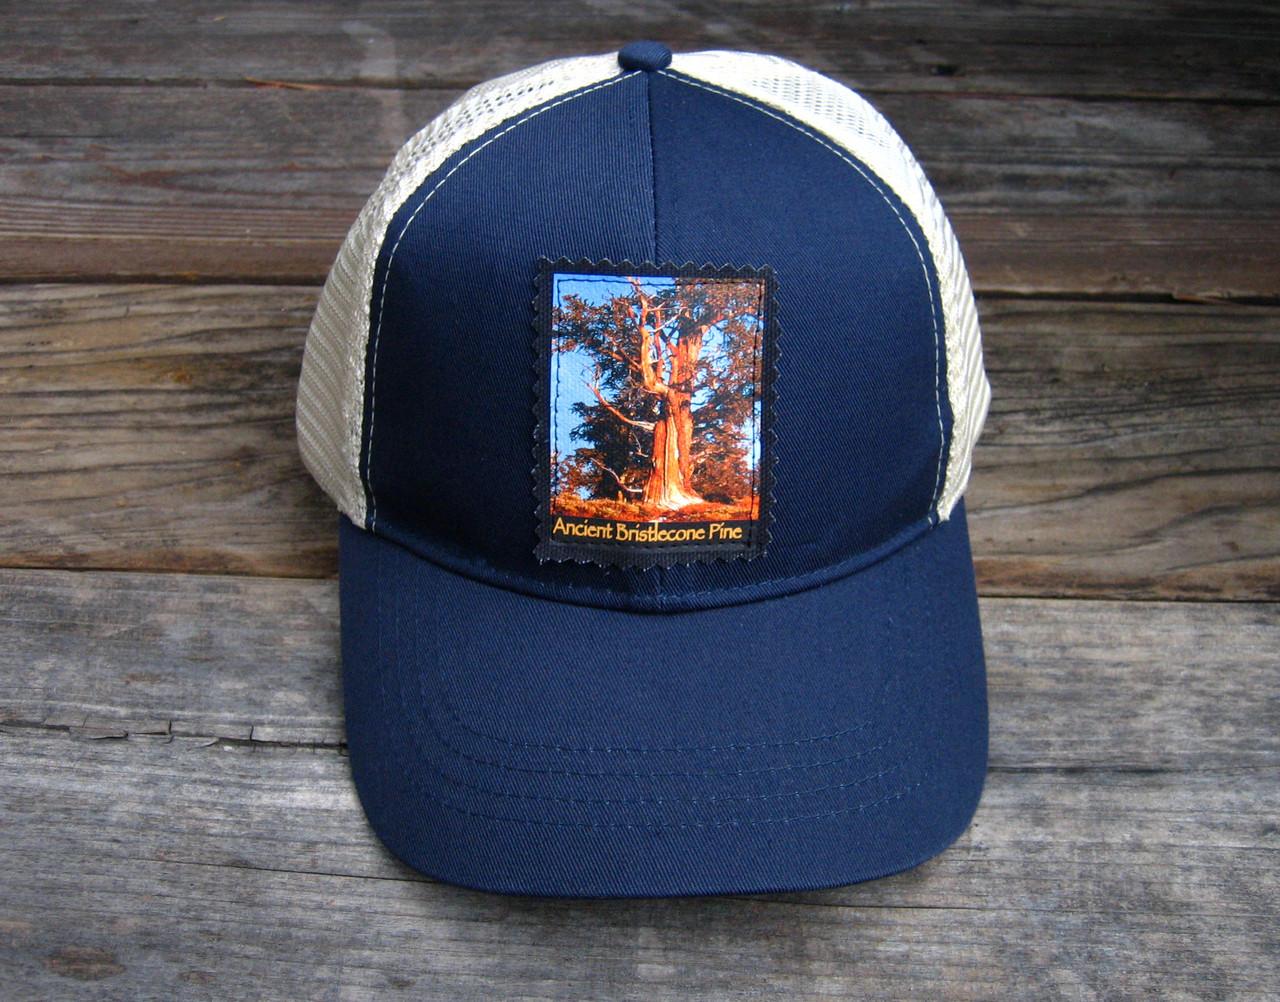 Ancient Bristlecone Pine at Sunrise Organic Cotton Keep on Truckin  Trucker  Hat - Dharma Love 913e5cfe1dc4